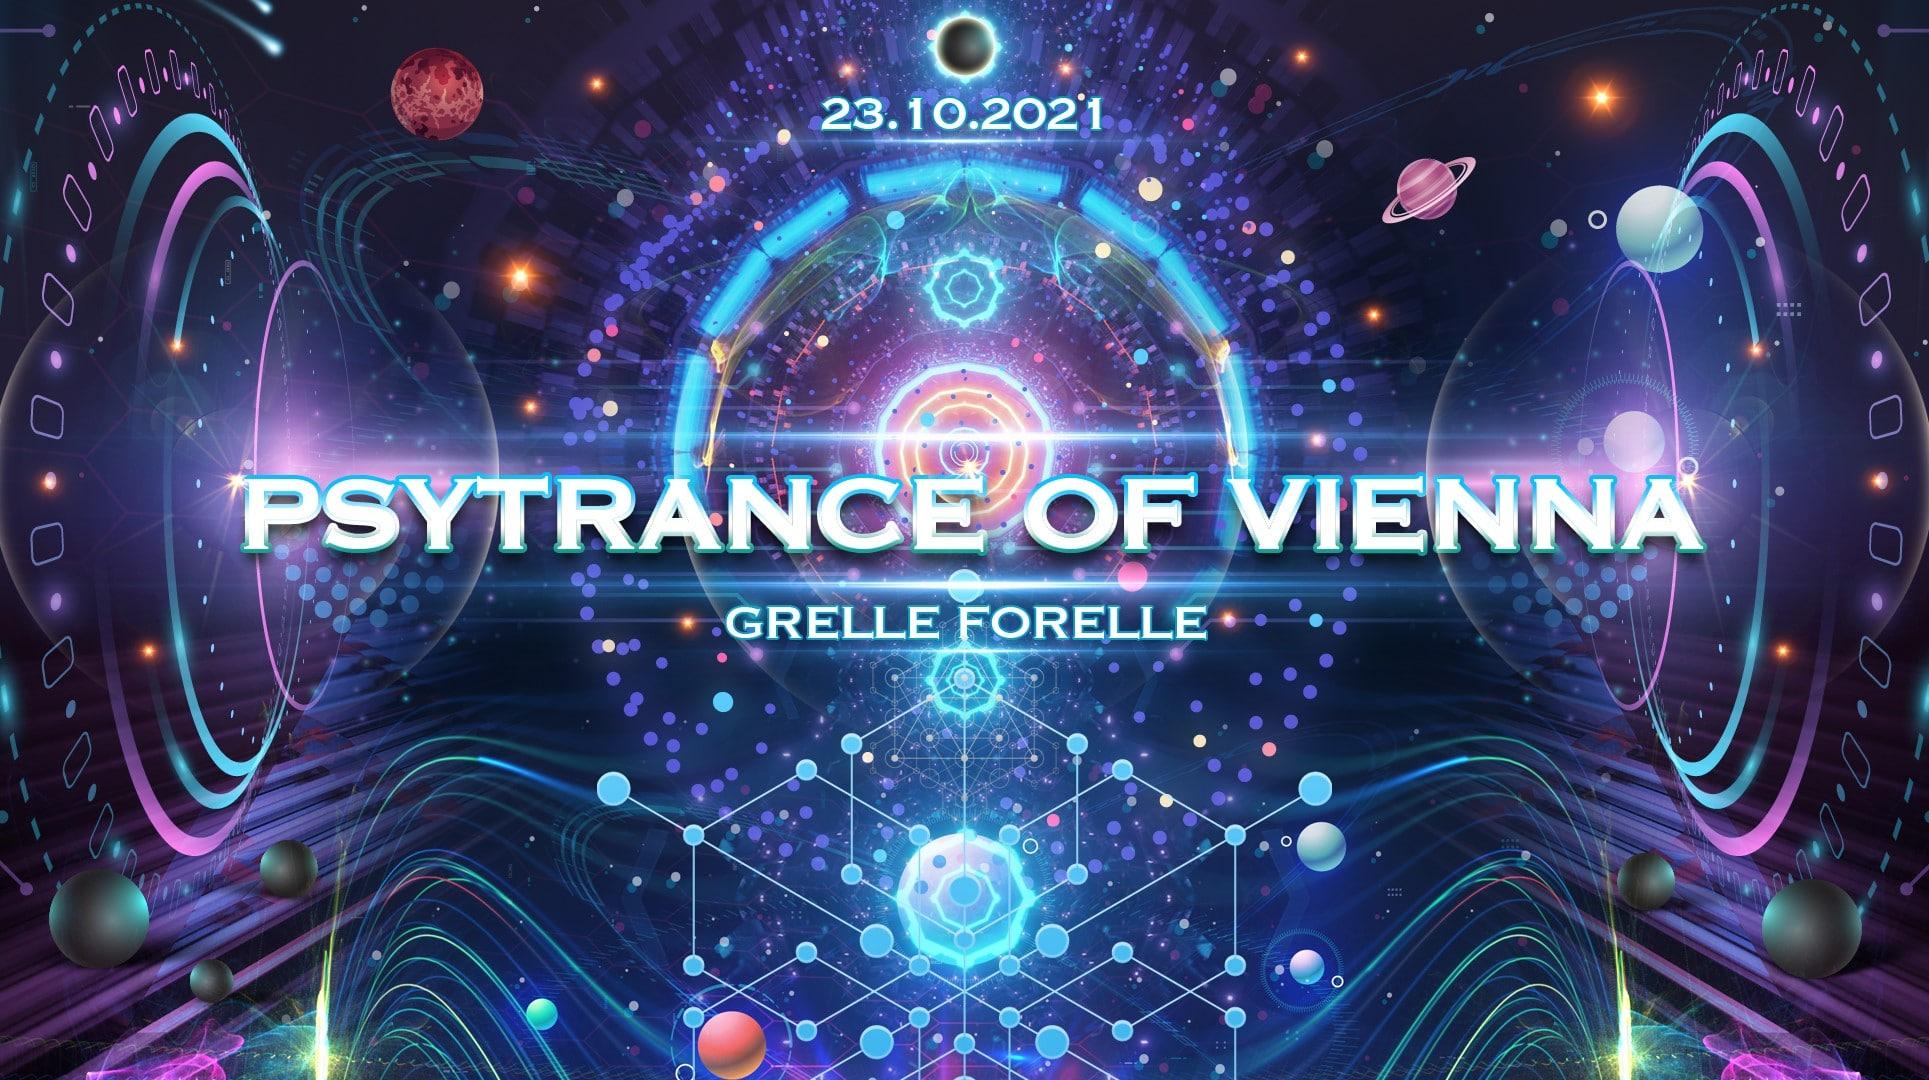 Events Wien: Psytrance of Vienna